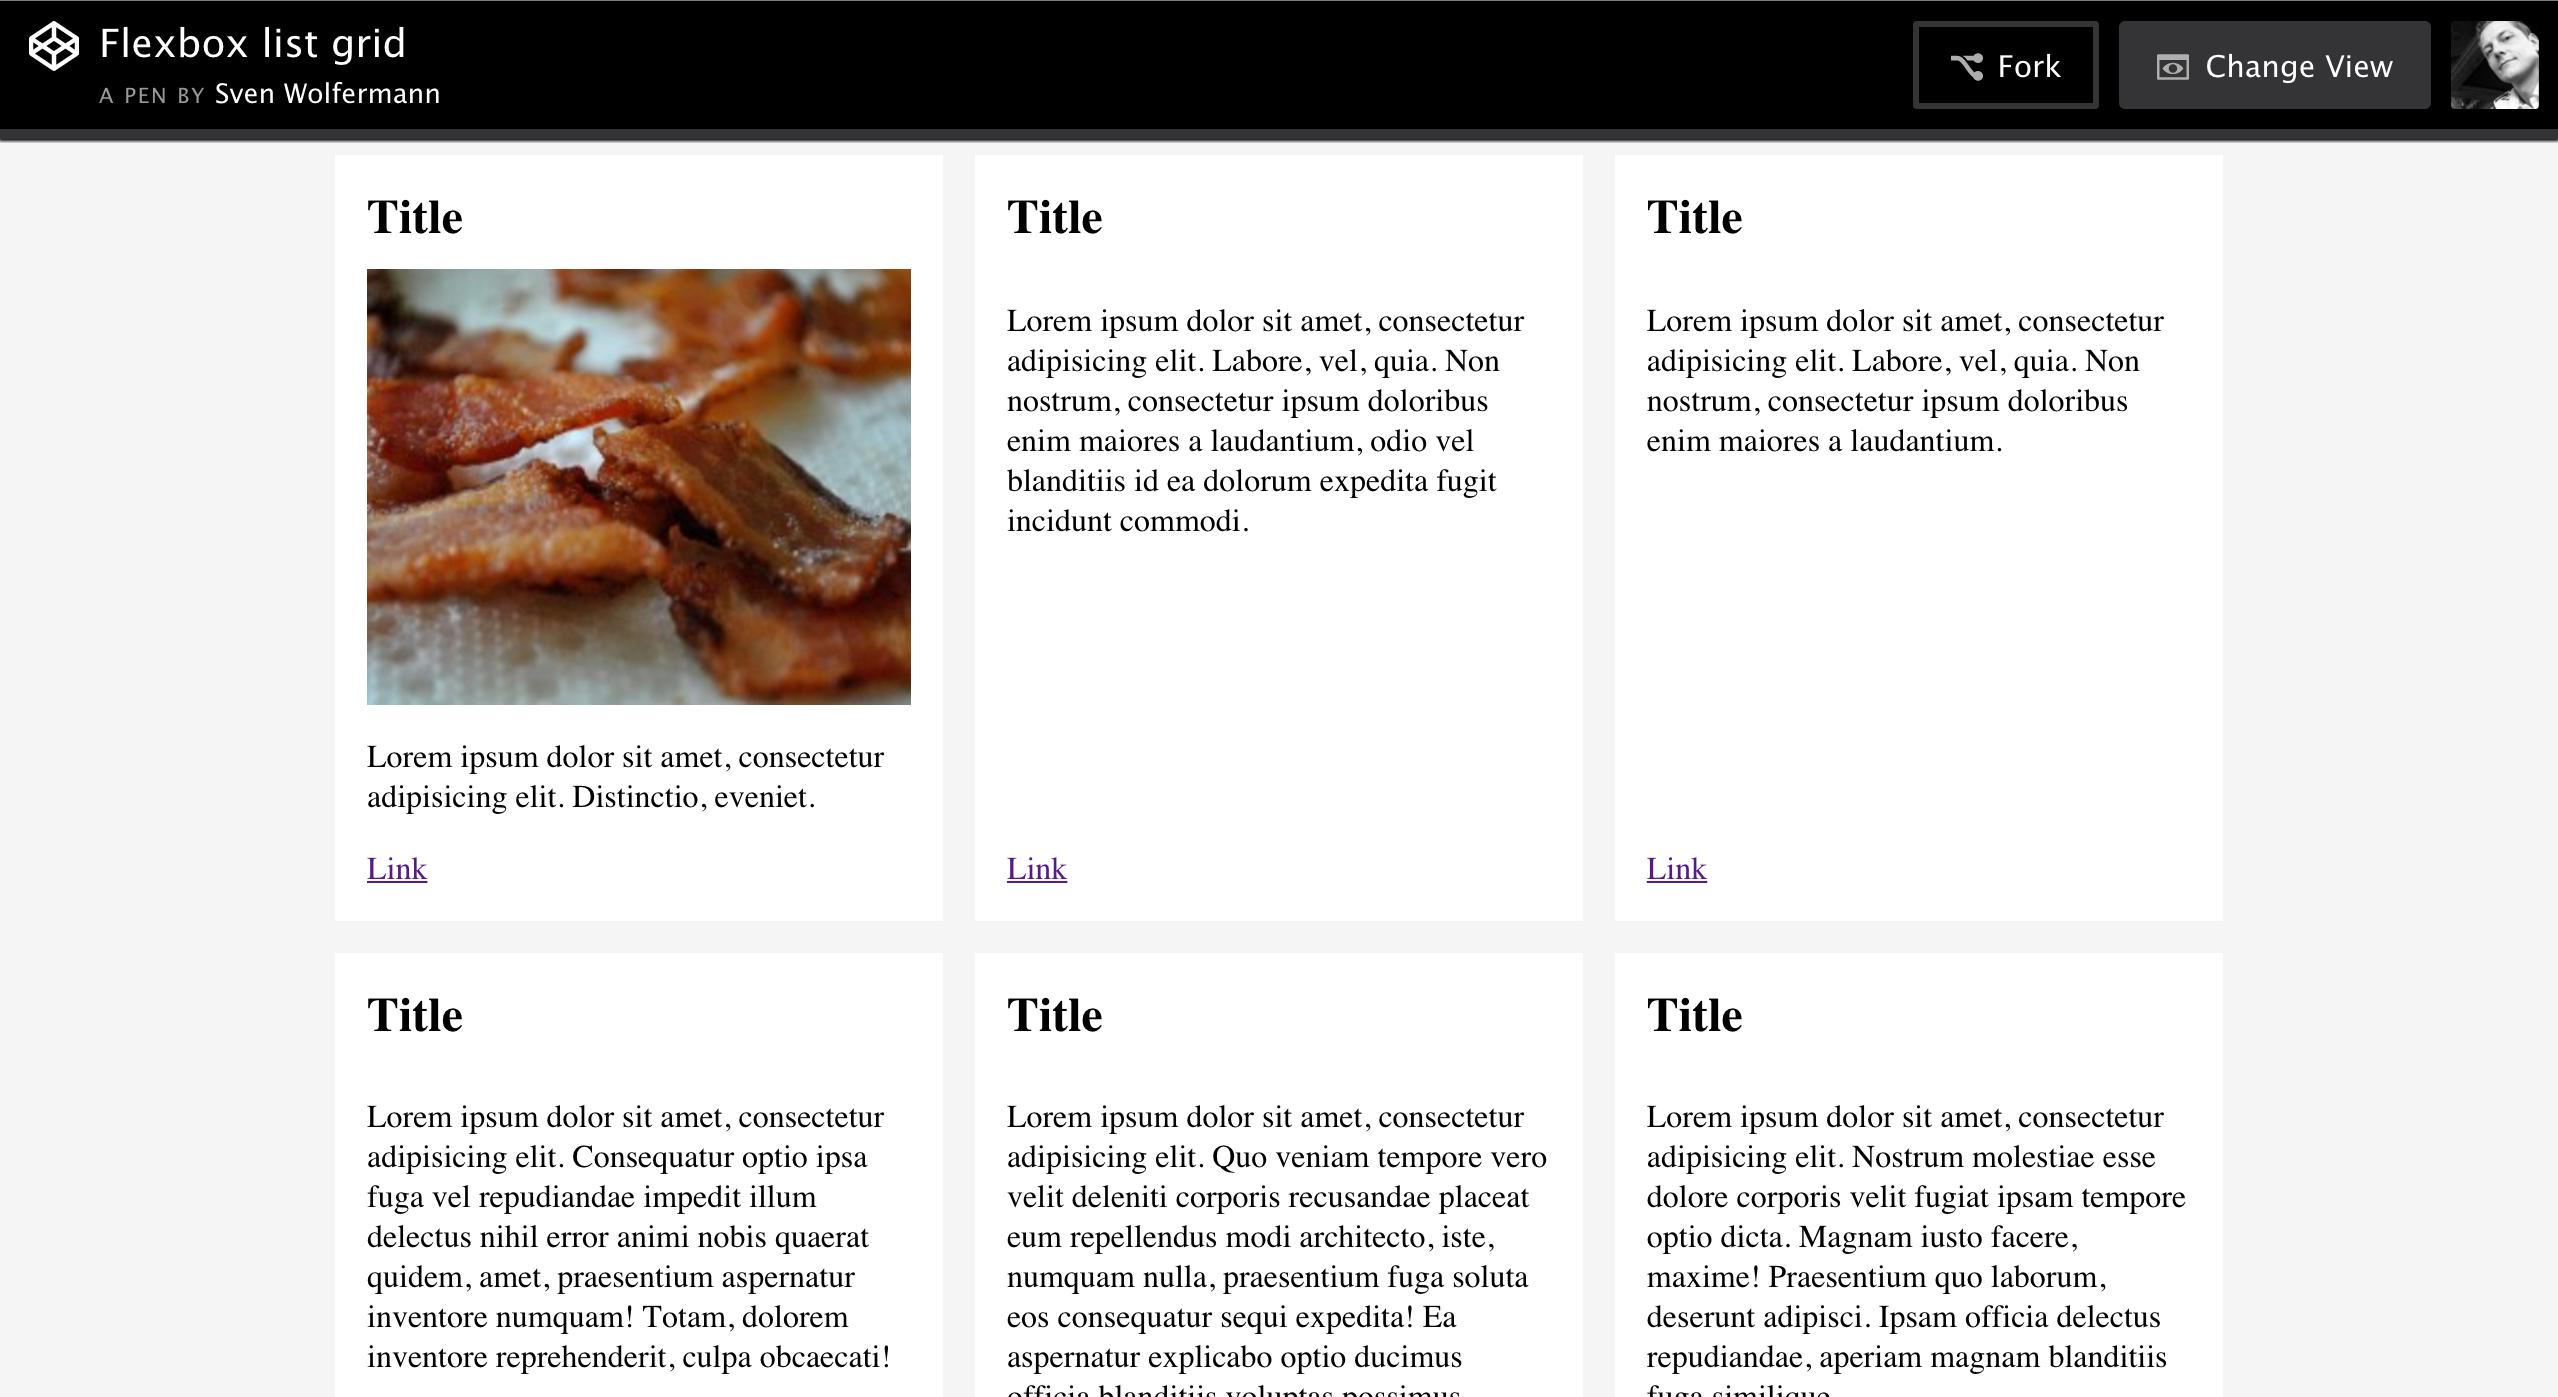 Latest Tricks in Responsive Web Design, maddesigns (Sven